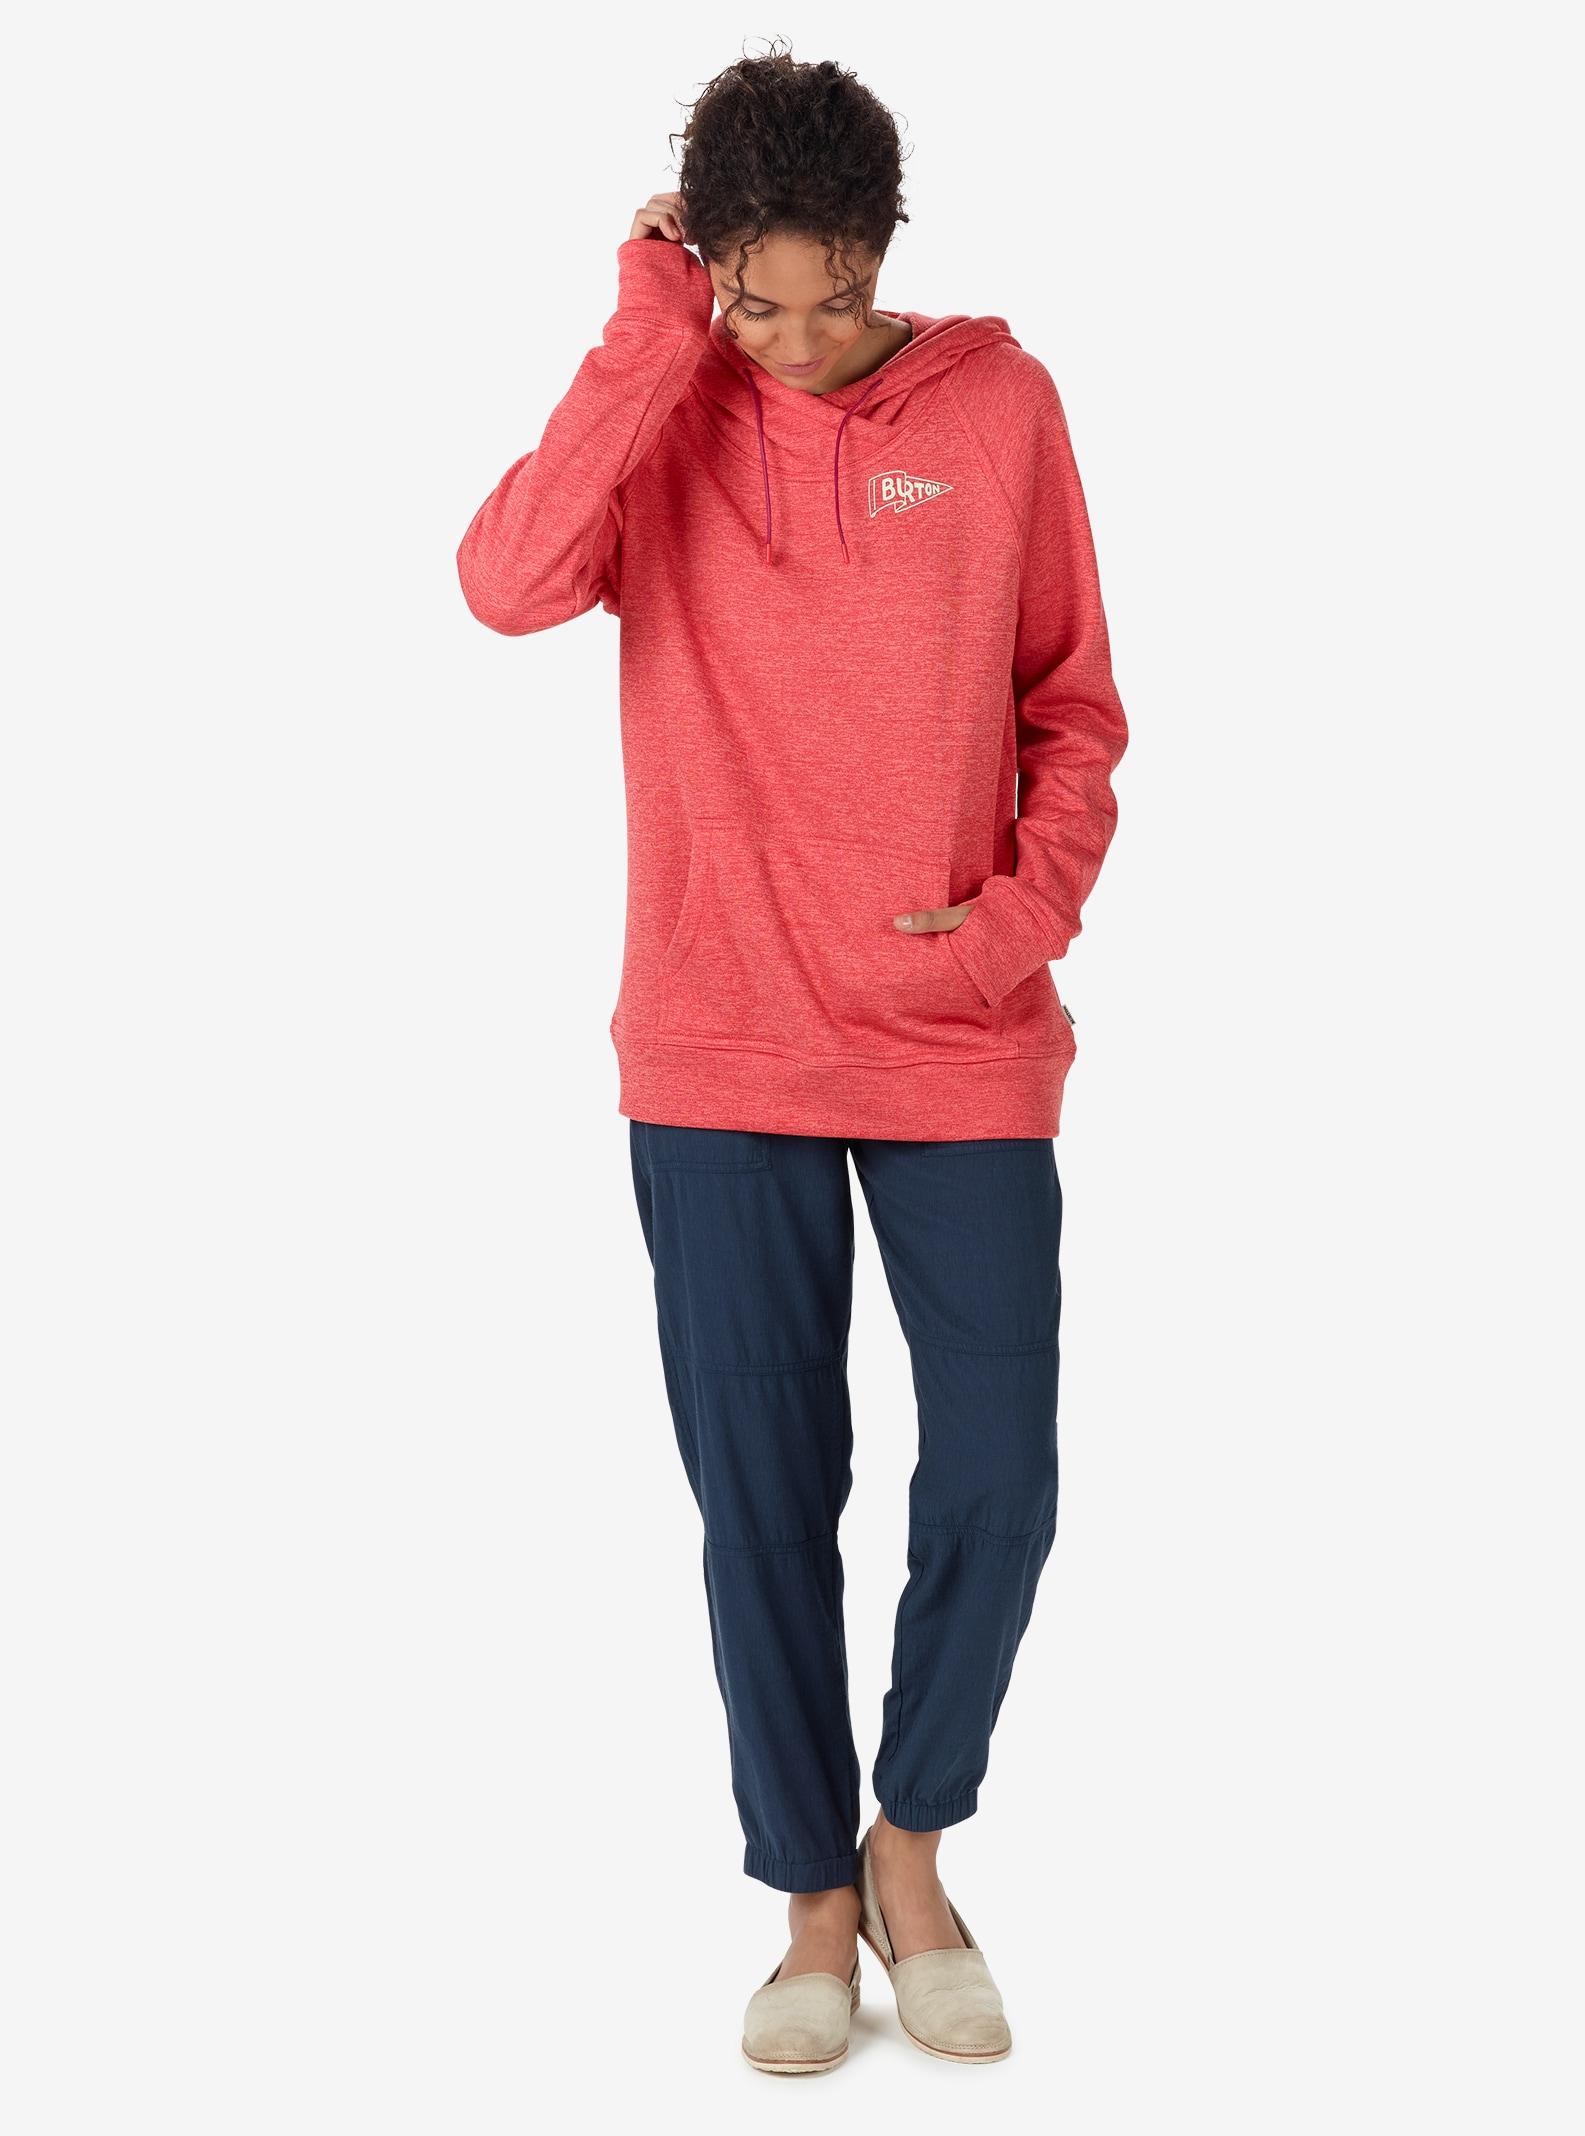 Burton Quartz Pullover Hoodie shown in Coral / Sashimi Heather